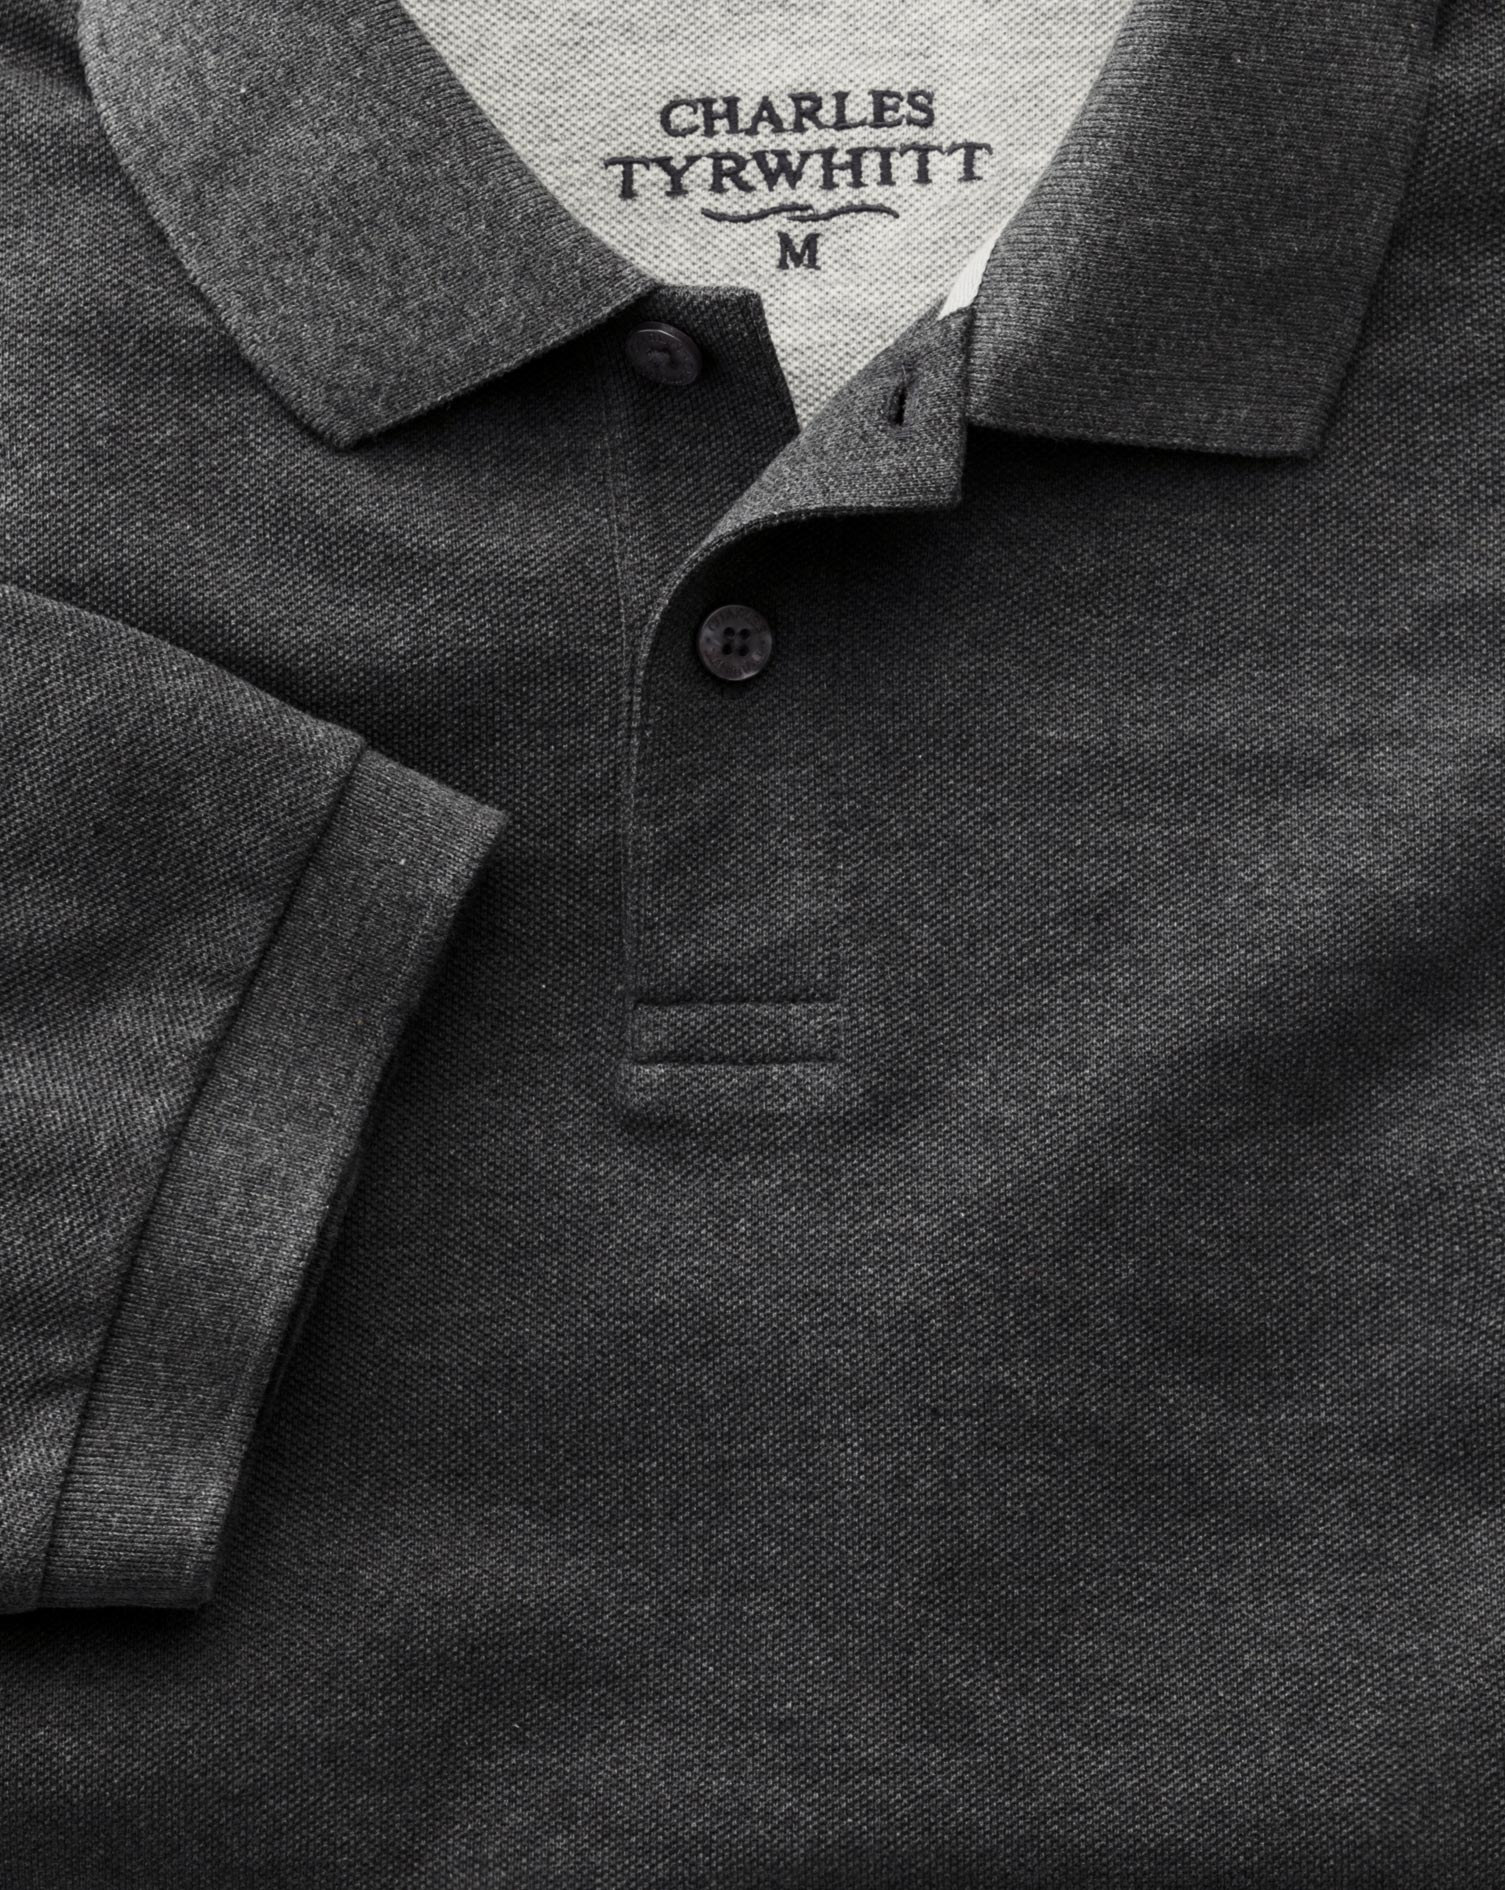 Charcoal Pique Polo Charles Tyrwhitt